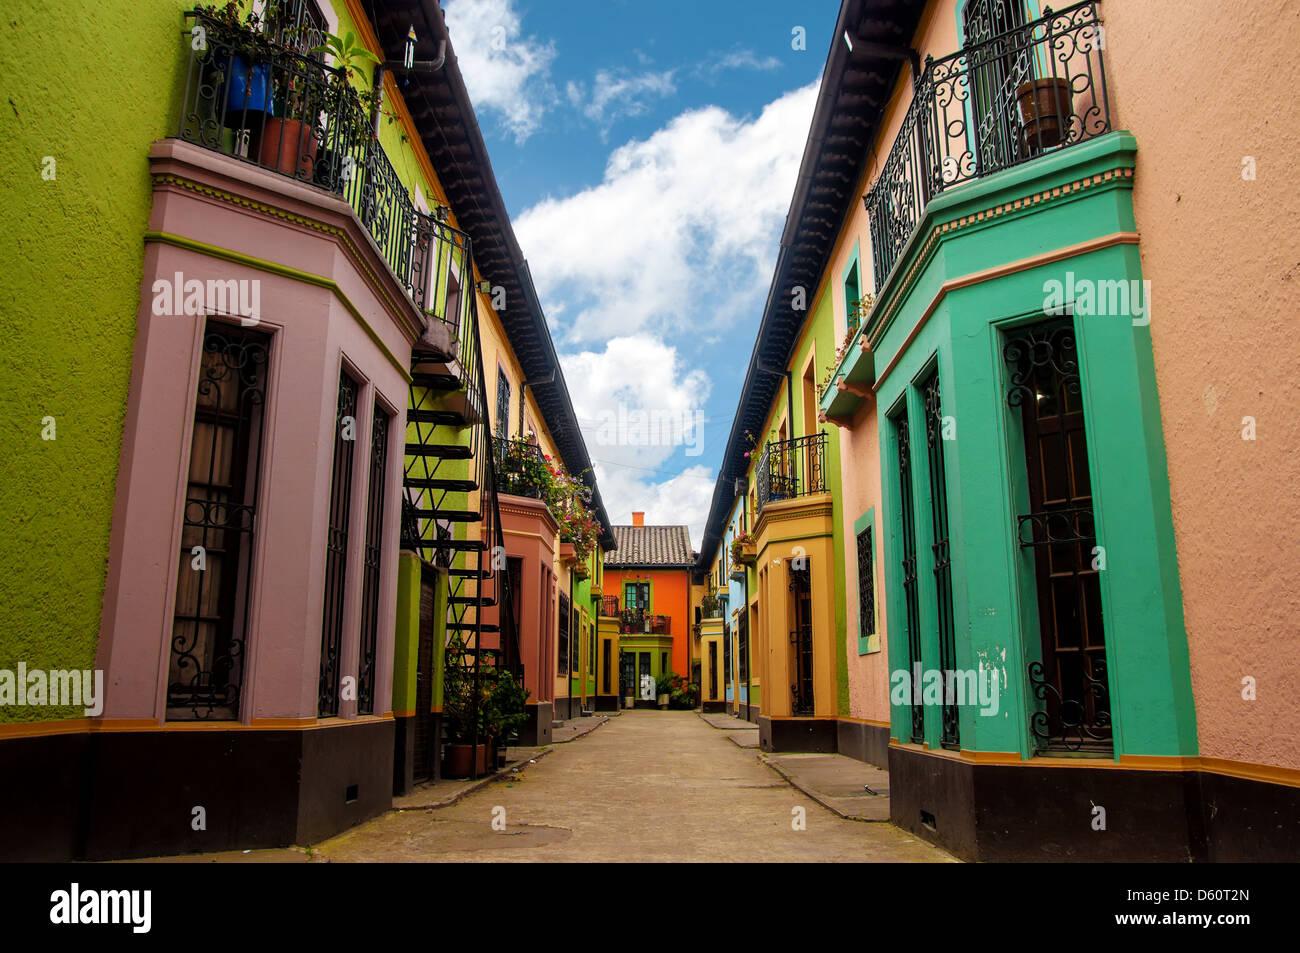 Leuchtend bunte historische Gebäude in Los Martires Nachbarschaft in Bogota, Kolumbien Stockbild